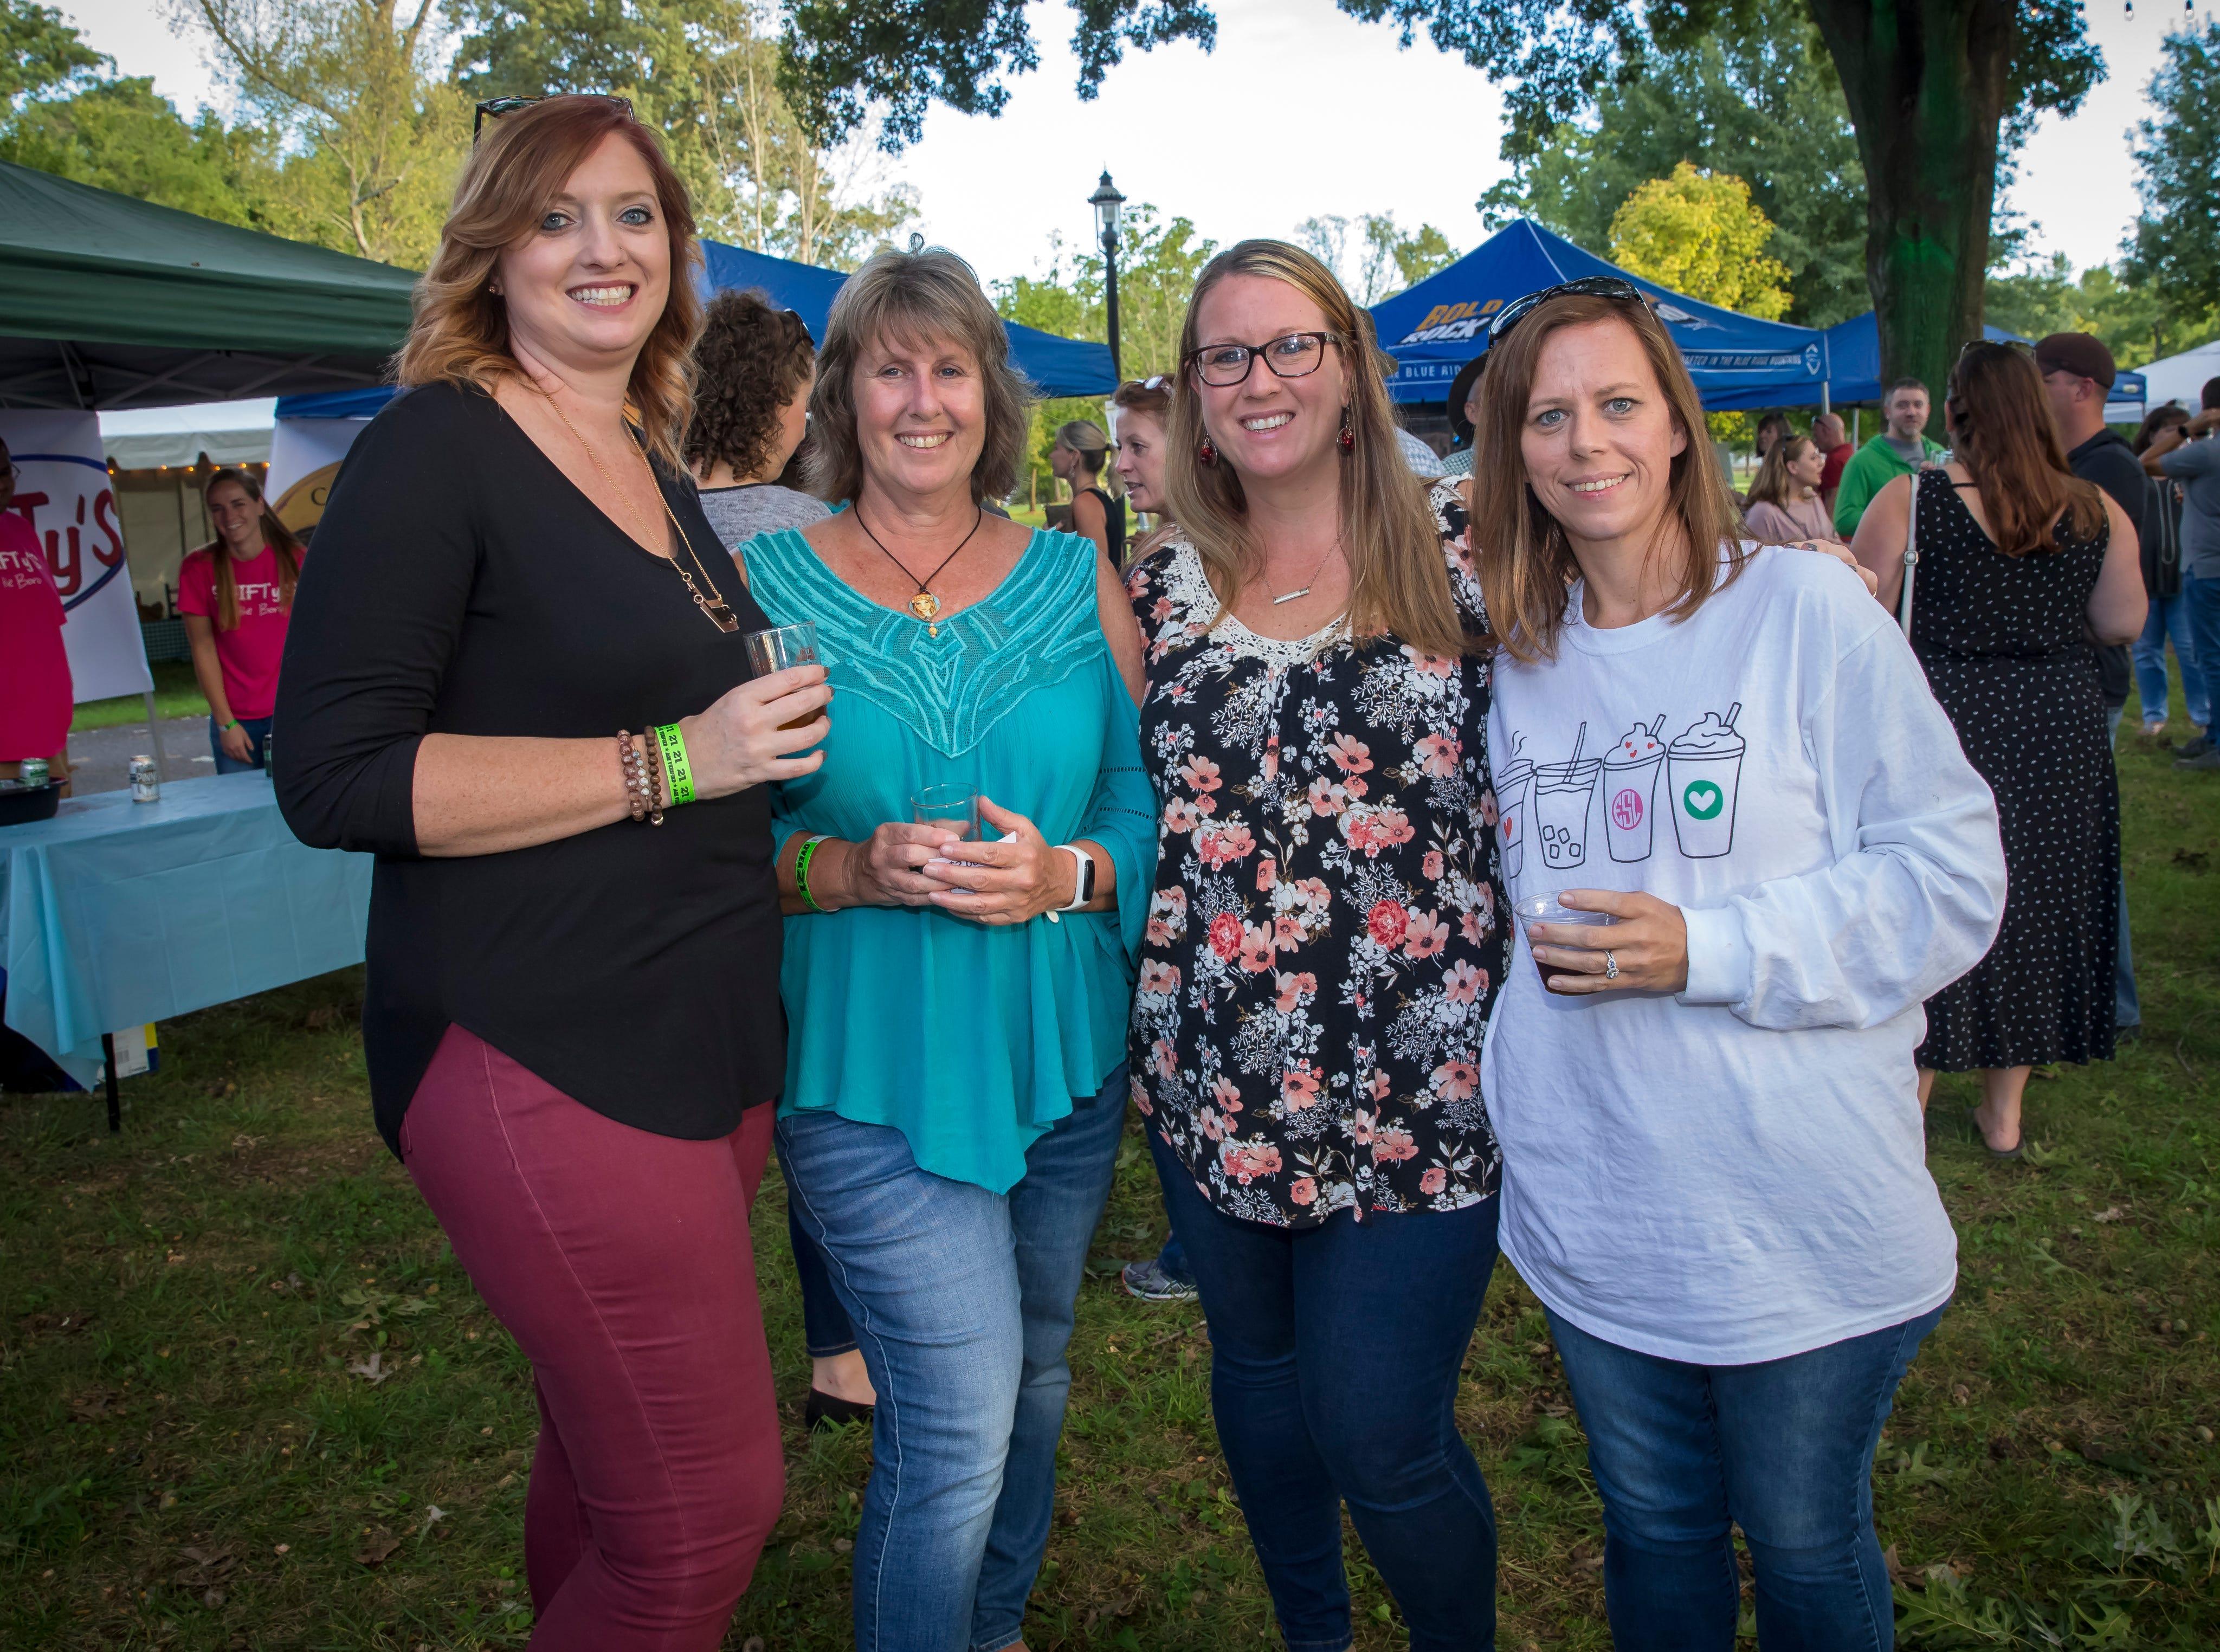 Lauren Stolz, Teri Kleber, Tiffany Huff and Emma Stiltz at the fourth-annual Oktoberfest held at Oaklands Mansion.Jim Davis/for the DNJ